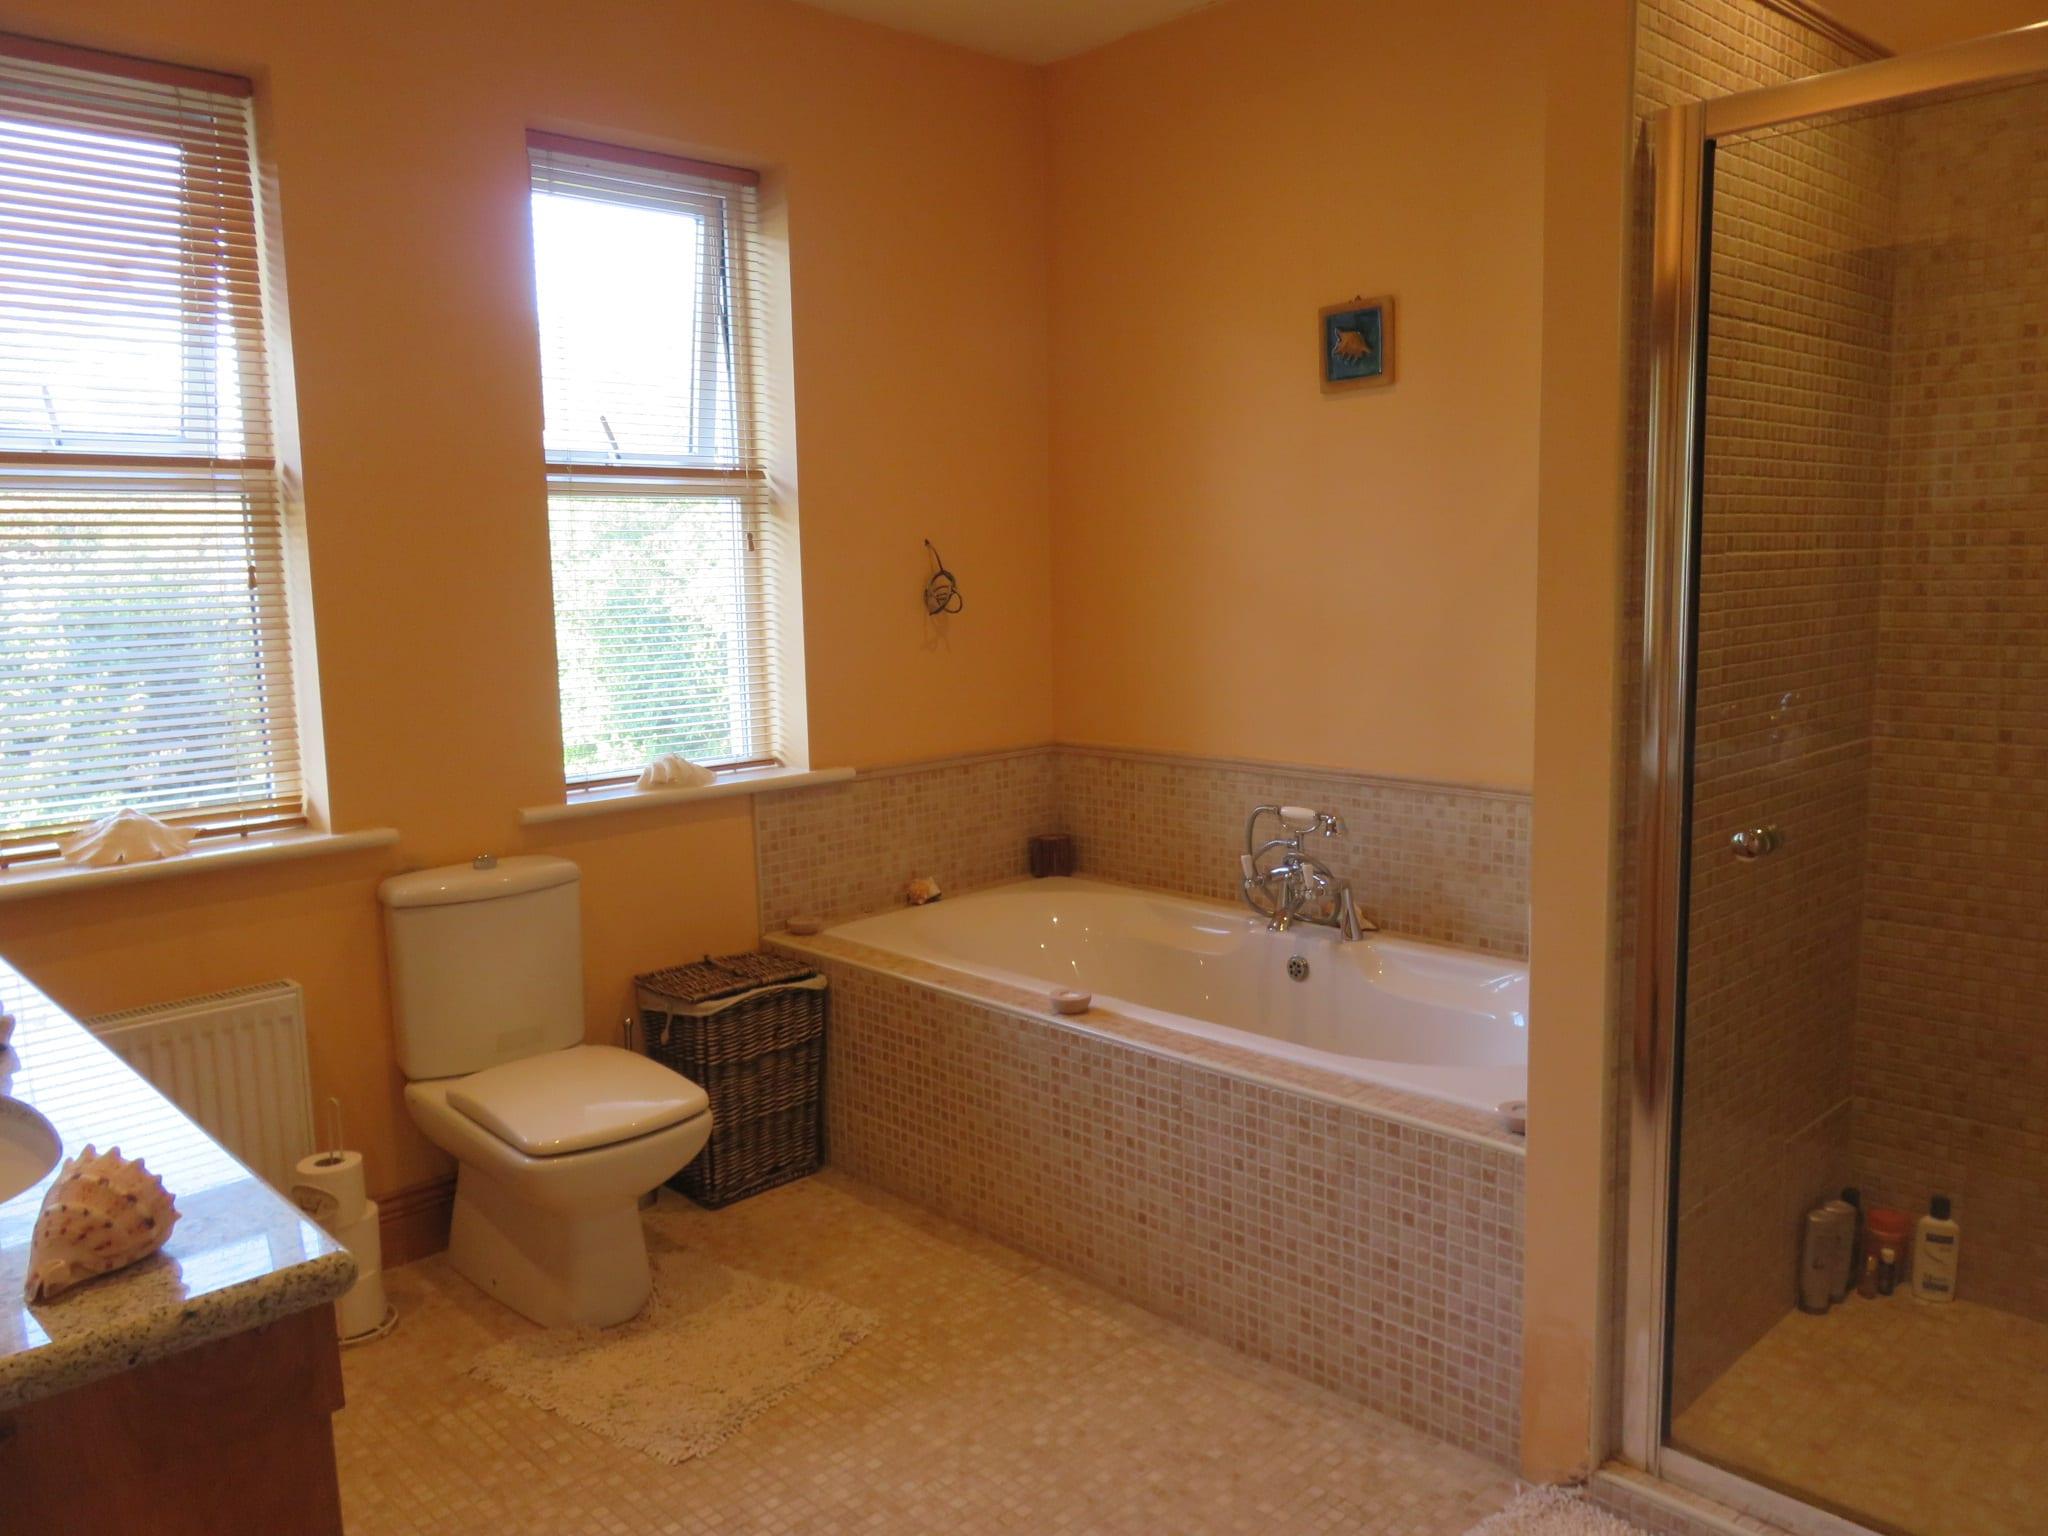 Bathroom IMG_7546